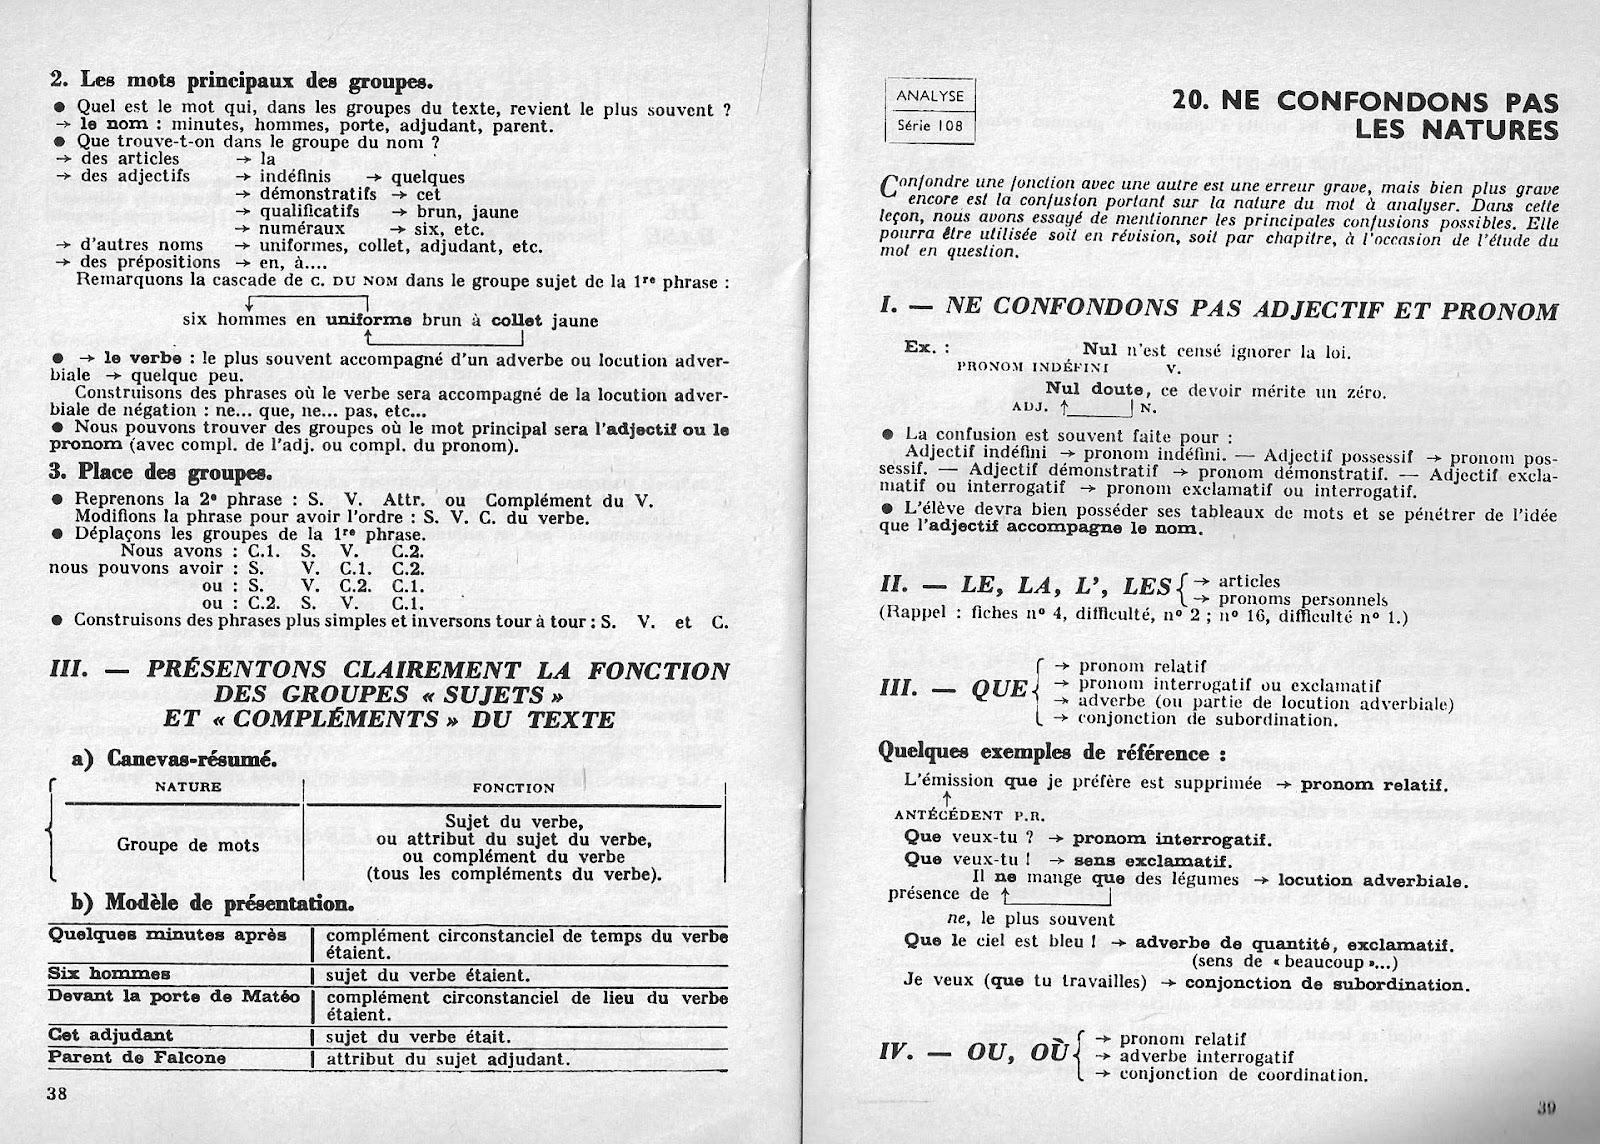 Manuels anciens: Tarnaud, Notions fondamentales d'analyse CM1, CM2, 6e, 5e (1964)